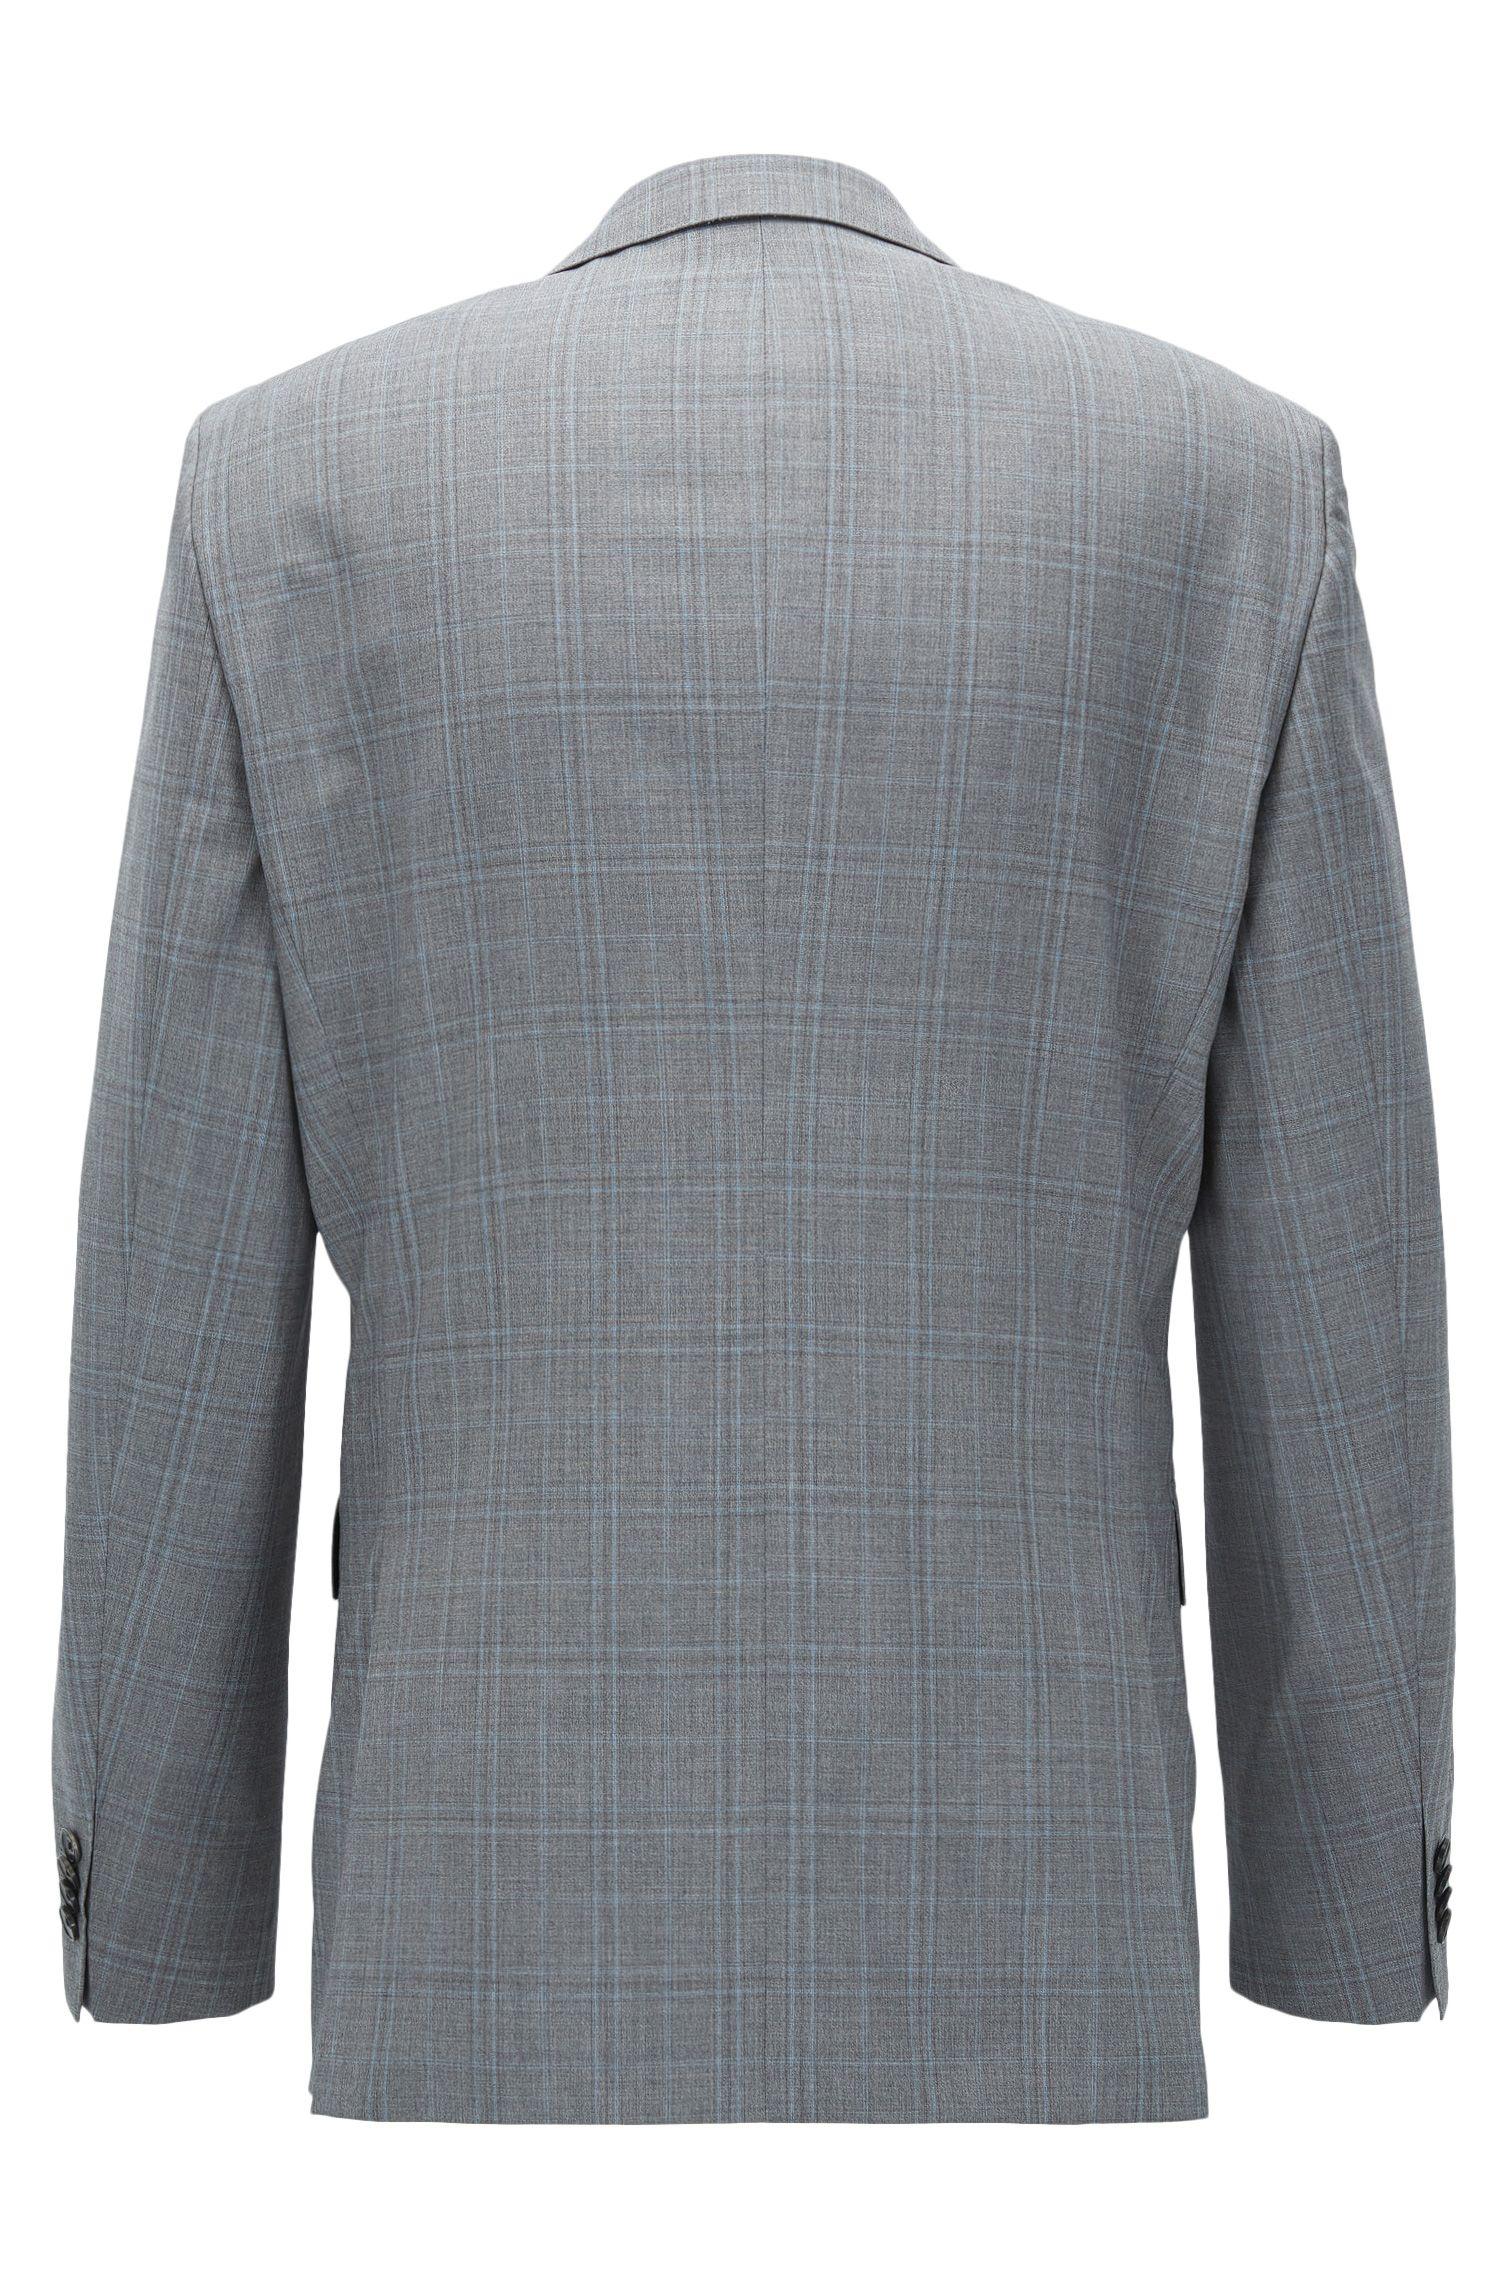 Plaid Virgin Wool Suit, Regular Fit | Johnstons/Lenon, Light Blue